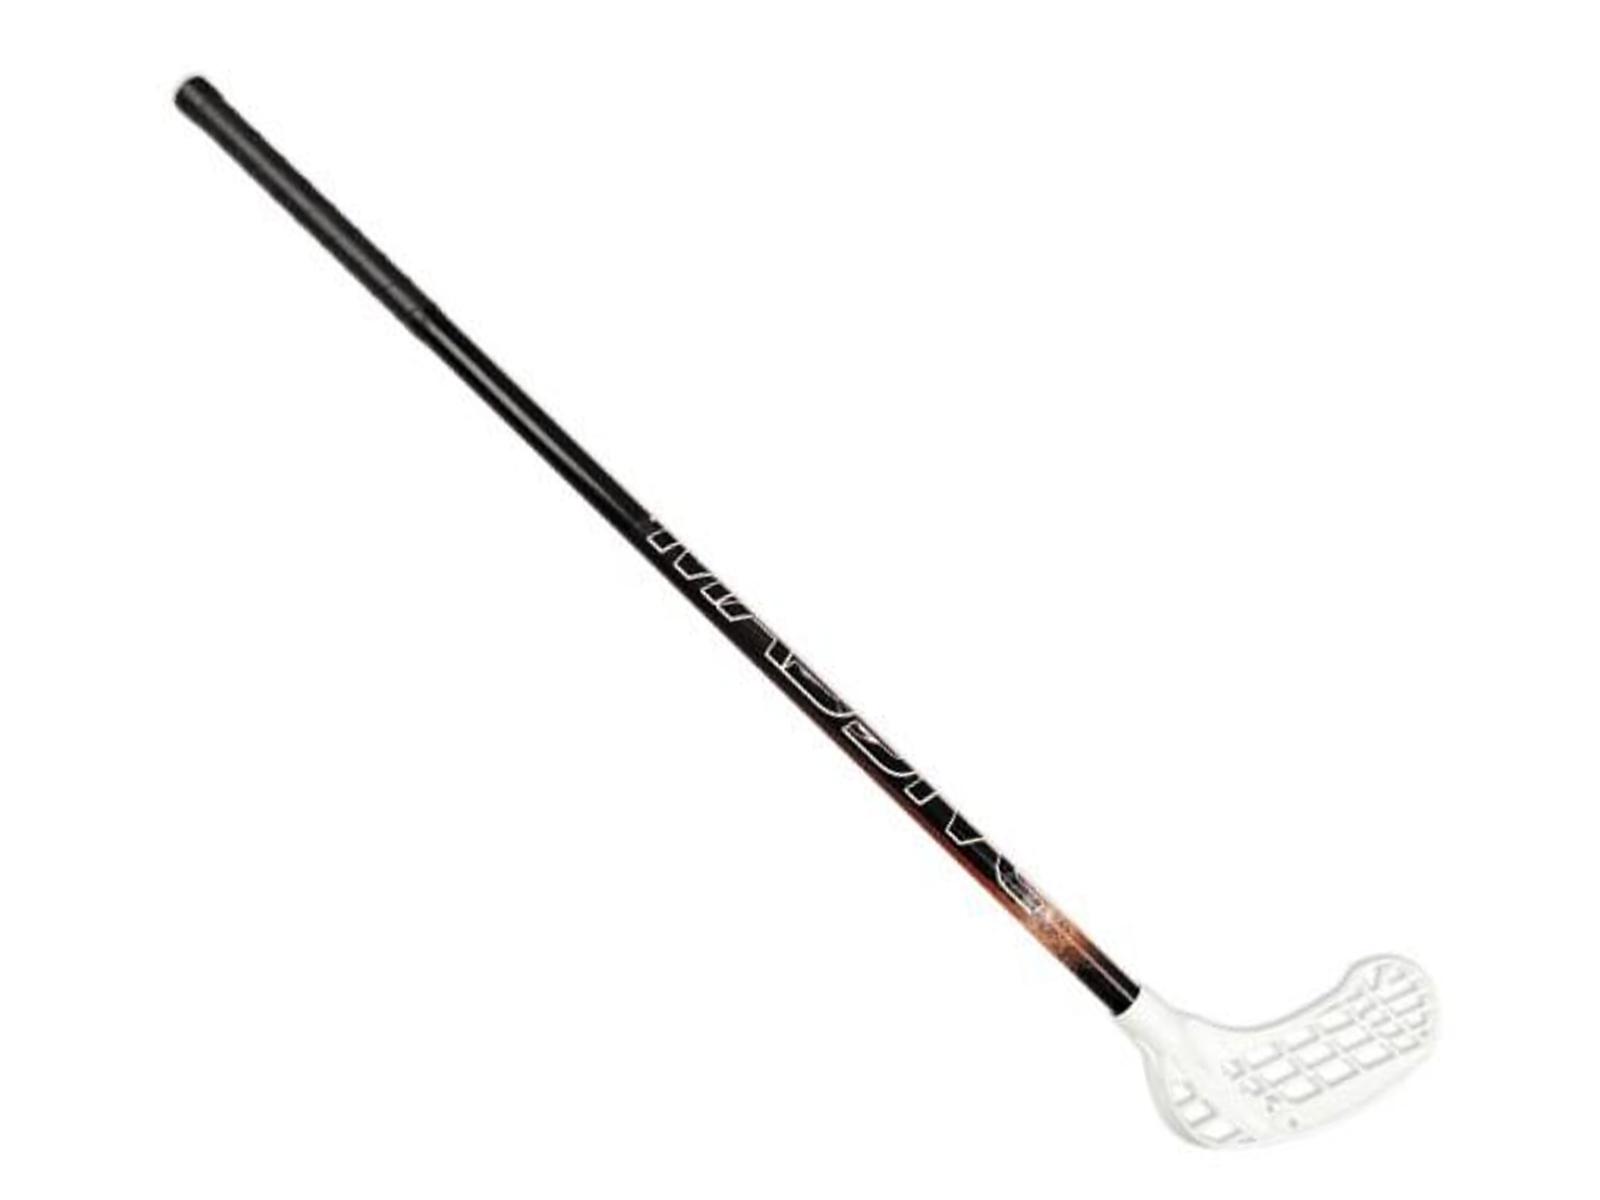 Florbalová hůl SPOKEY Massig 95R, bílá čepel